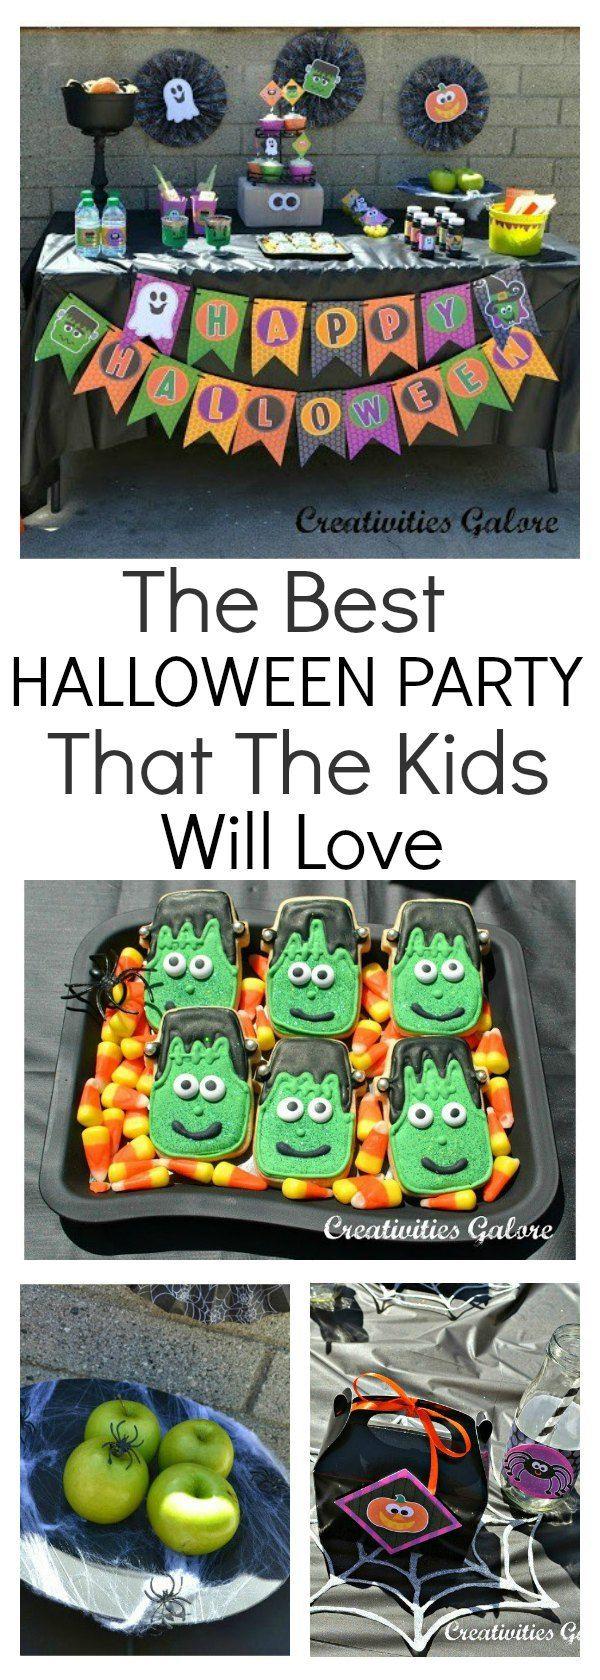 Kids halloween party decorations - 25 Best Halloween Birthday Decorations Ideas On Pinterest Halloween Dance Halloween Party For Kids And Easy Halloween Decorations